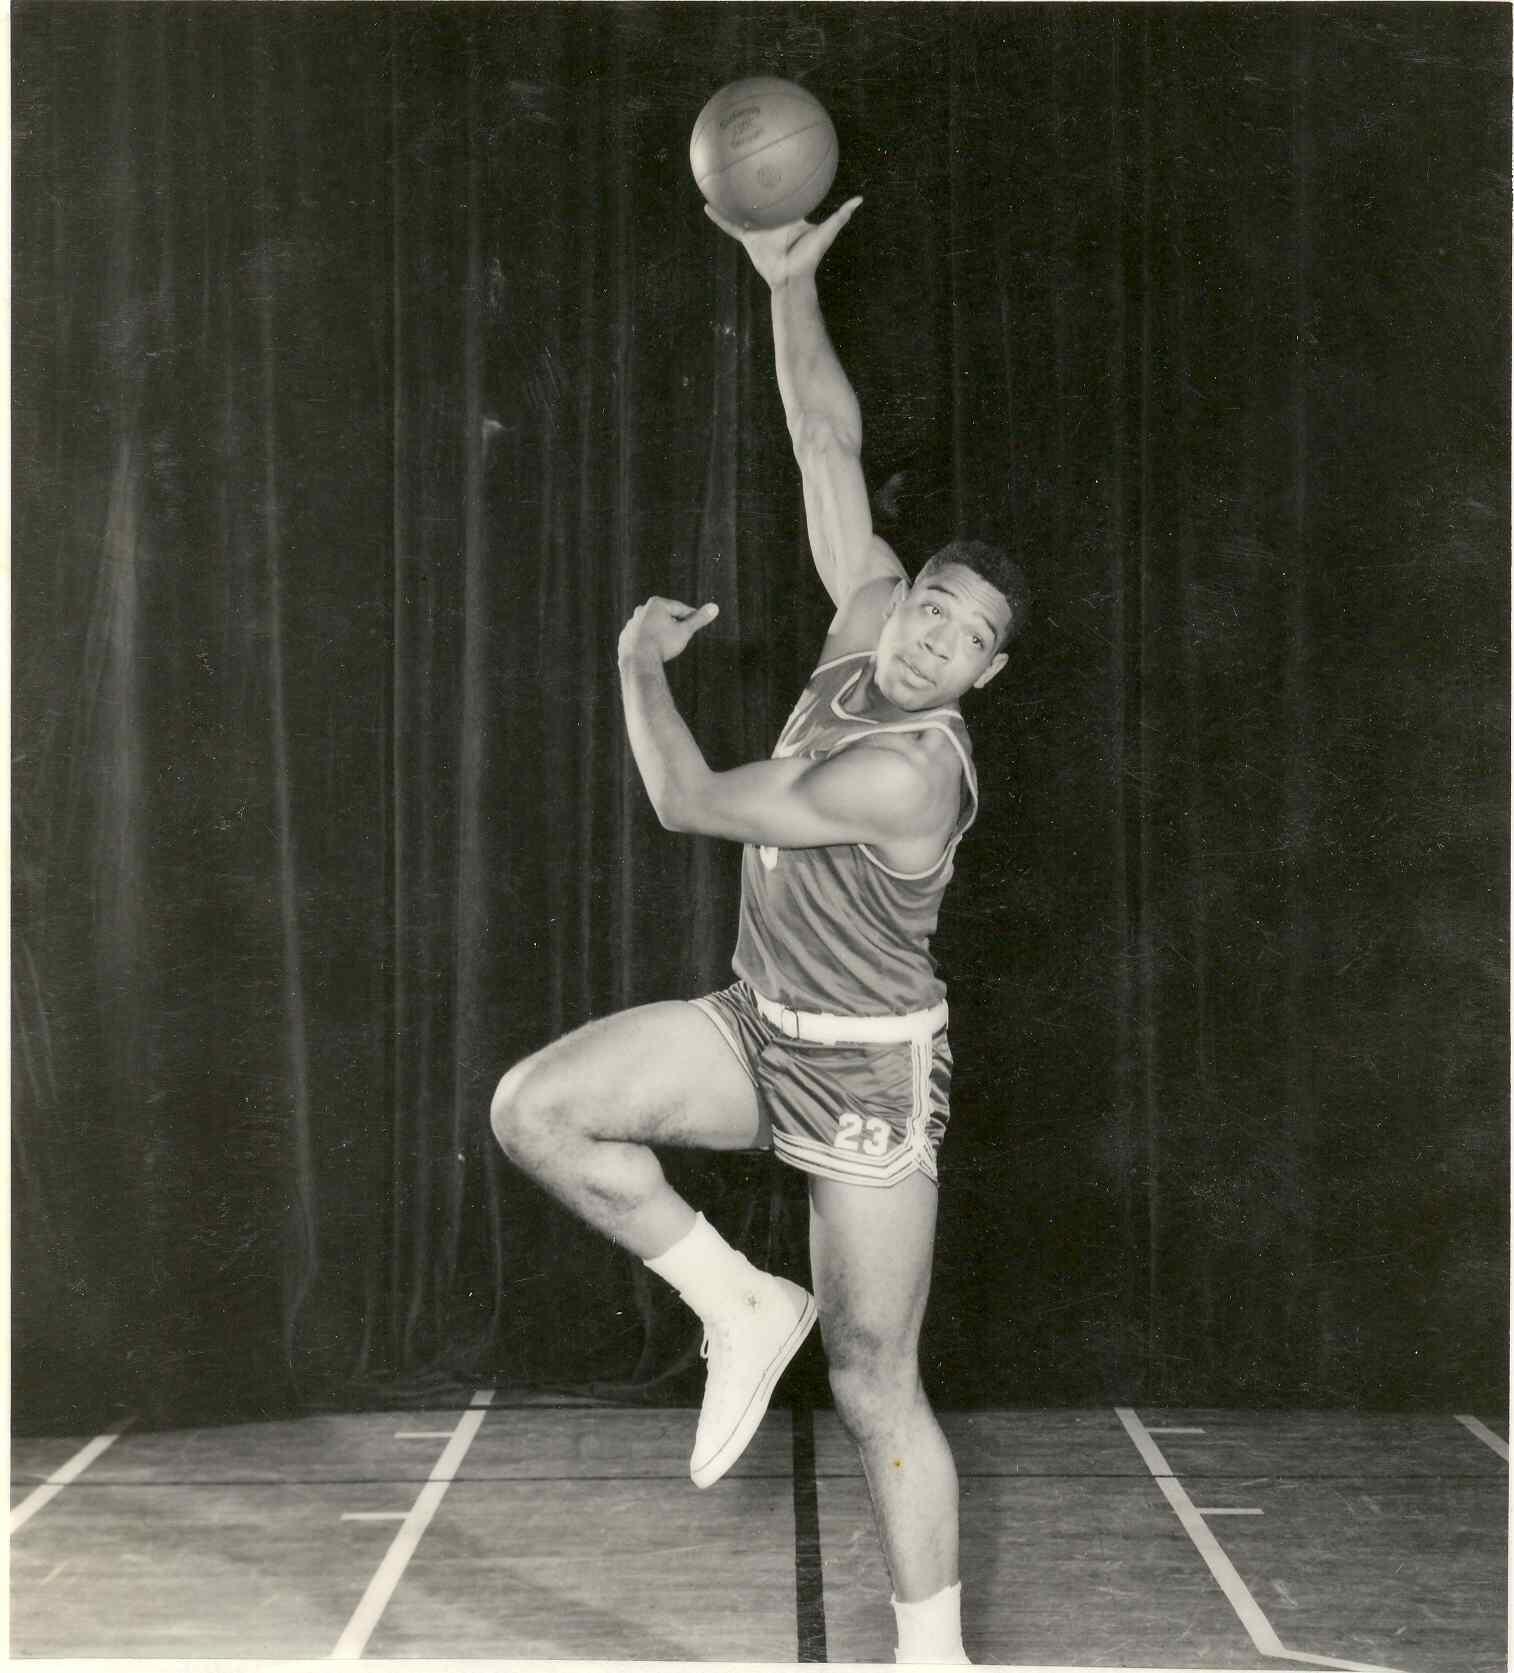 Tecumseh Basketball History